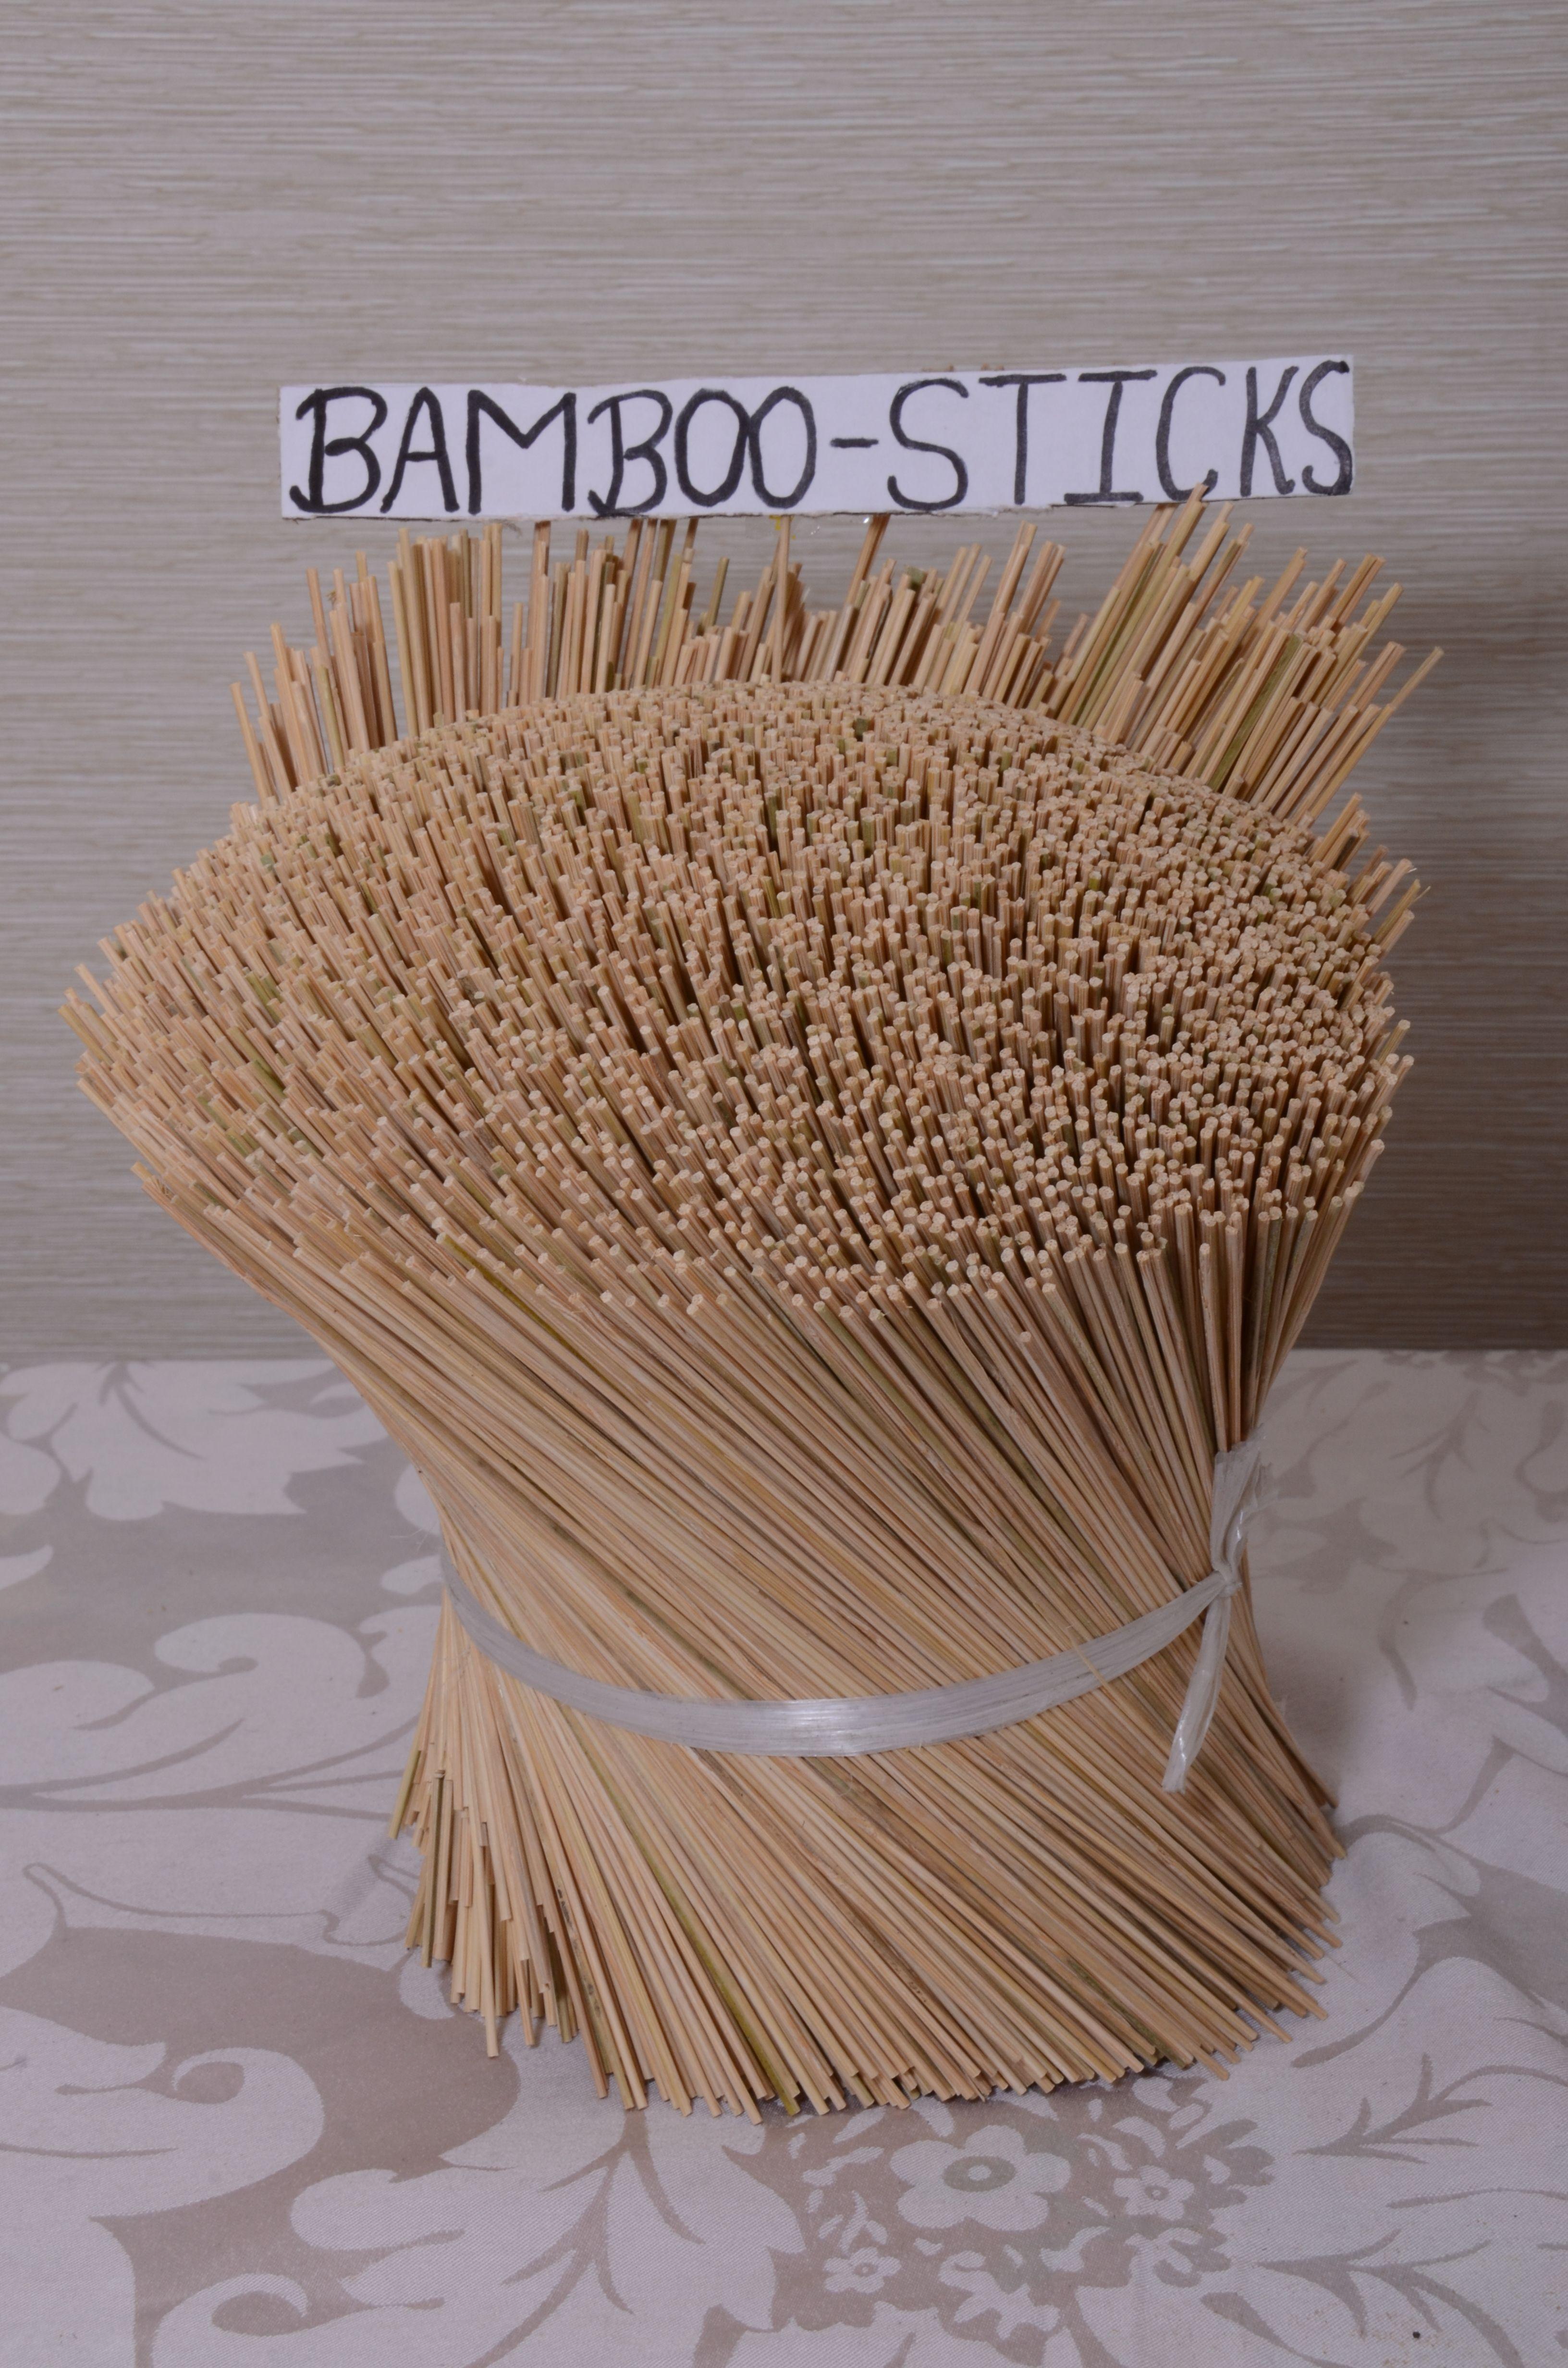 agarbatti bamboo stick suppliers, charcoal powder, wood